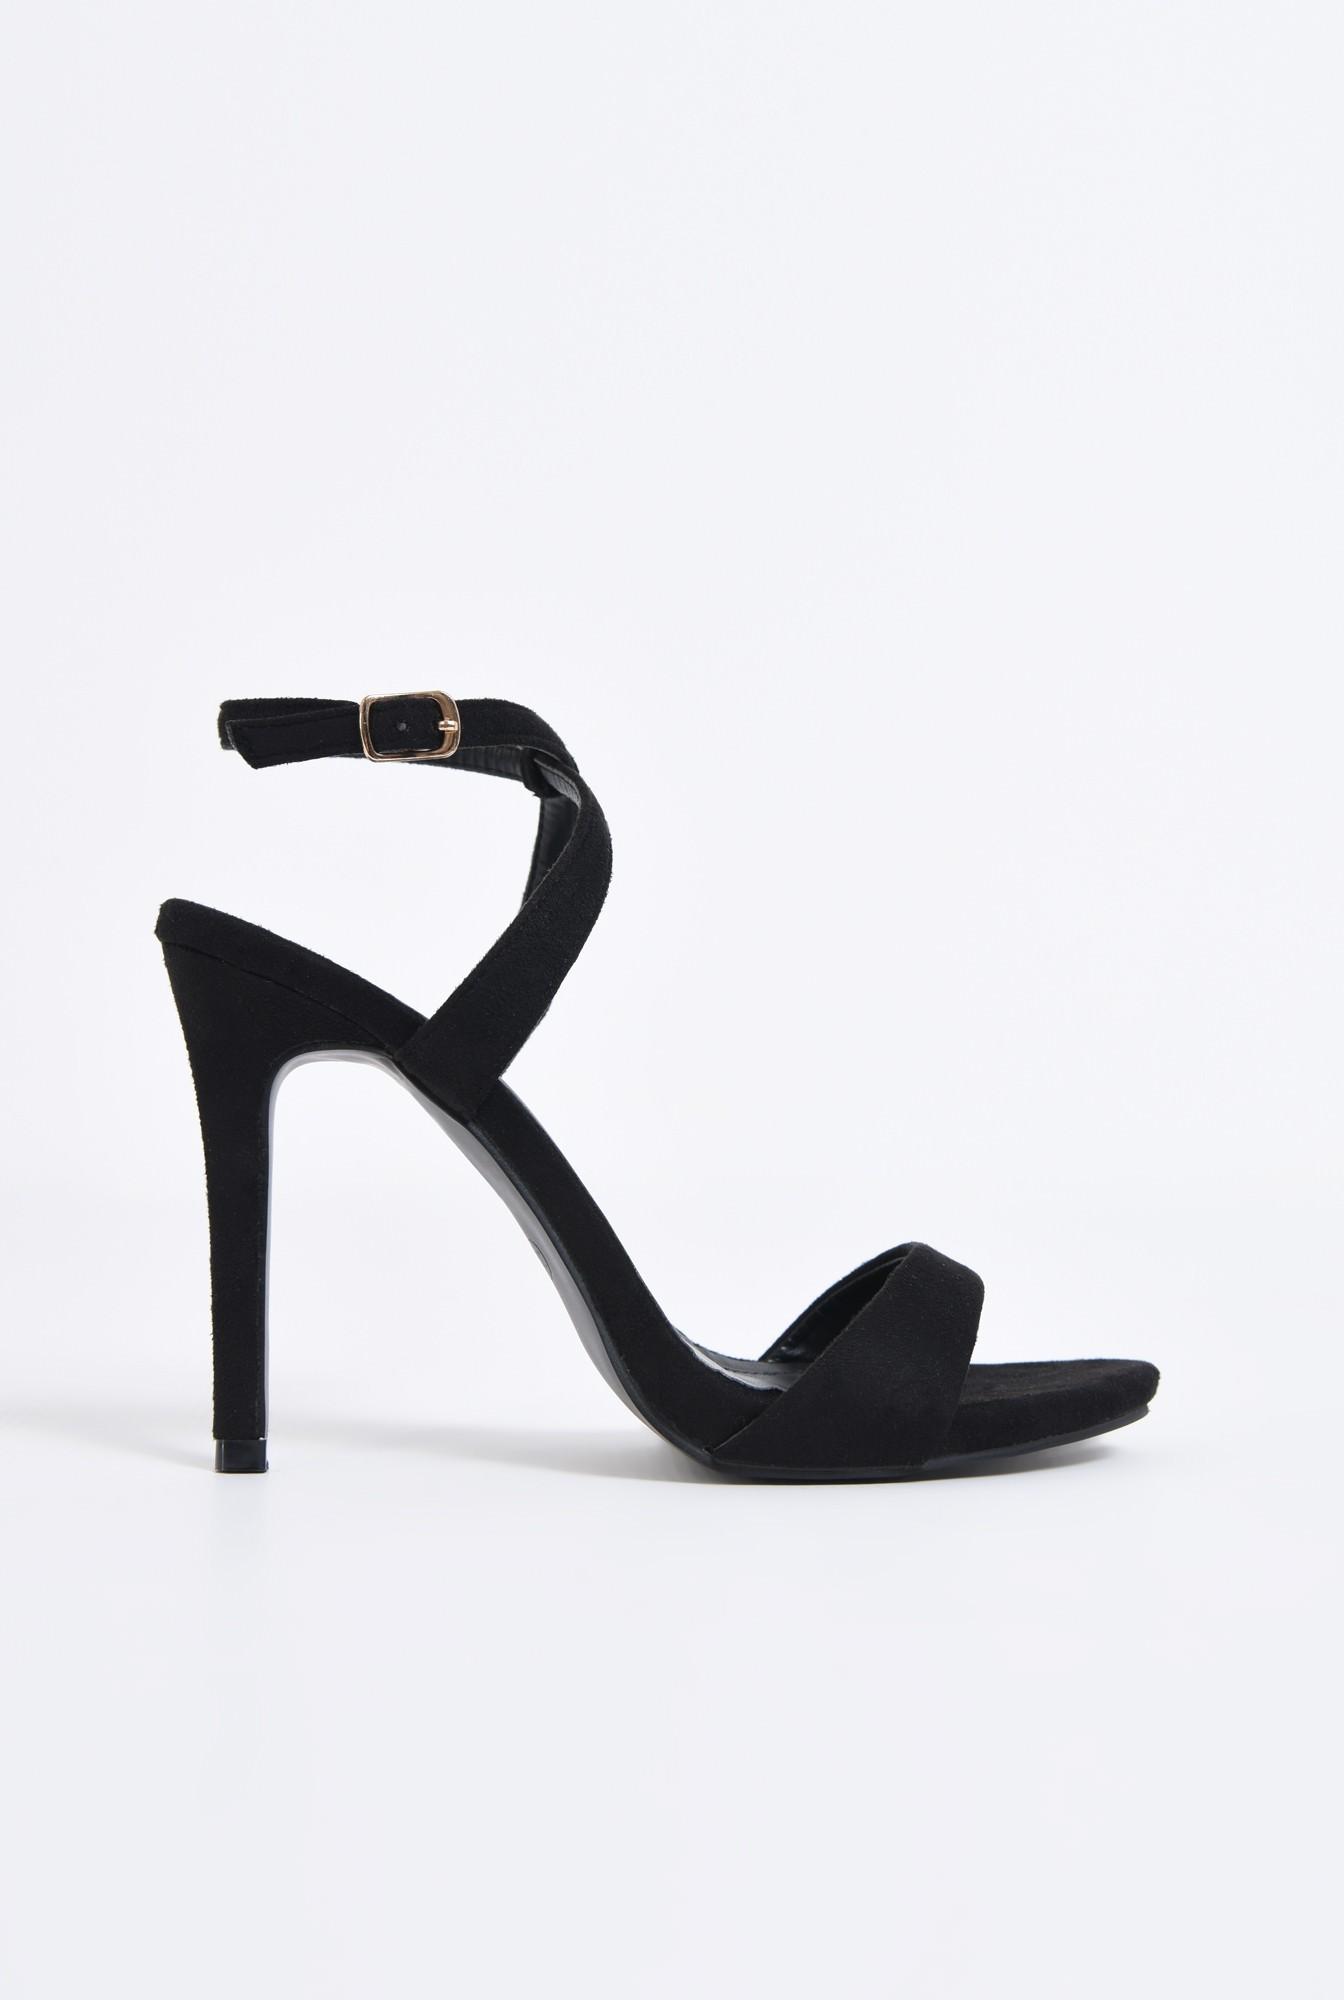 0 - sandale elegante, velur, negru, toc cui